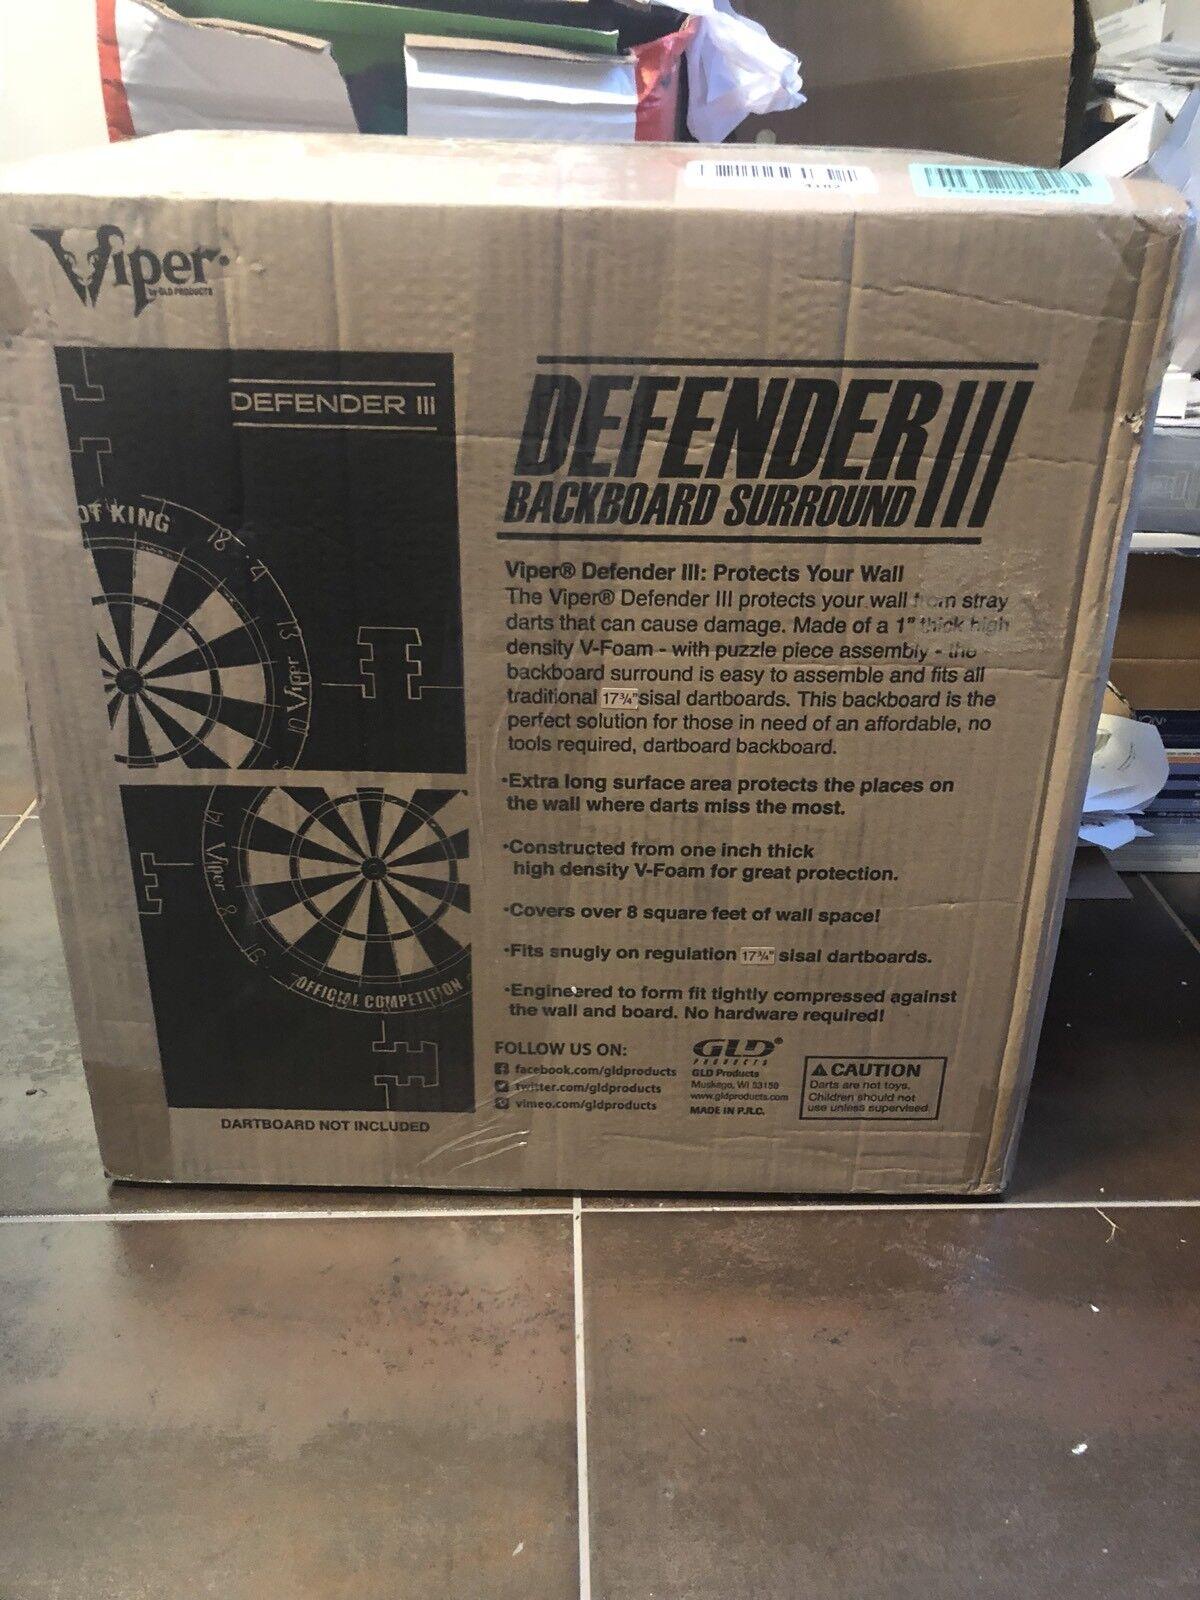 "Defender III  3  Dartboard Surround Wall Predector STEEL TIP DARTS 1"" V-Foam Pad"